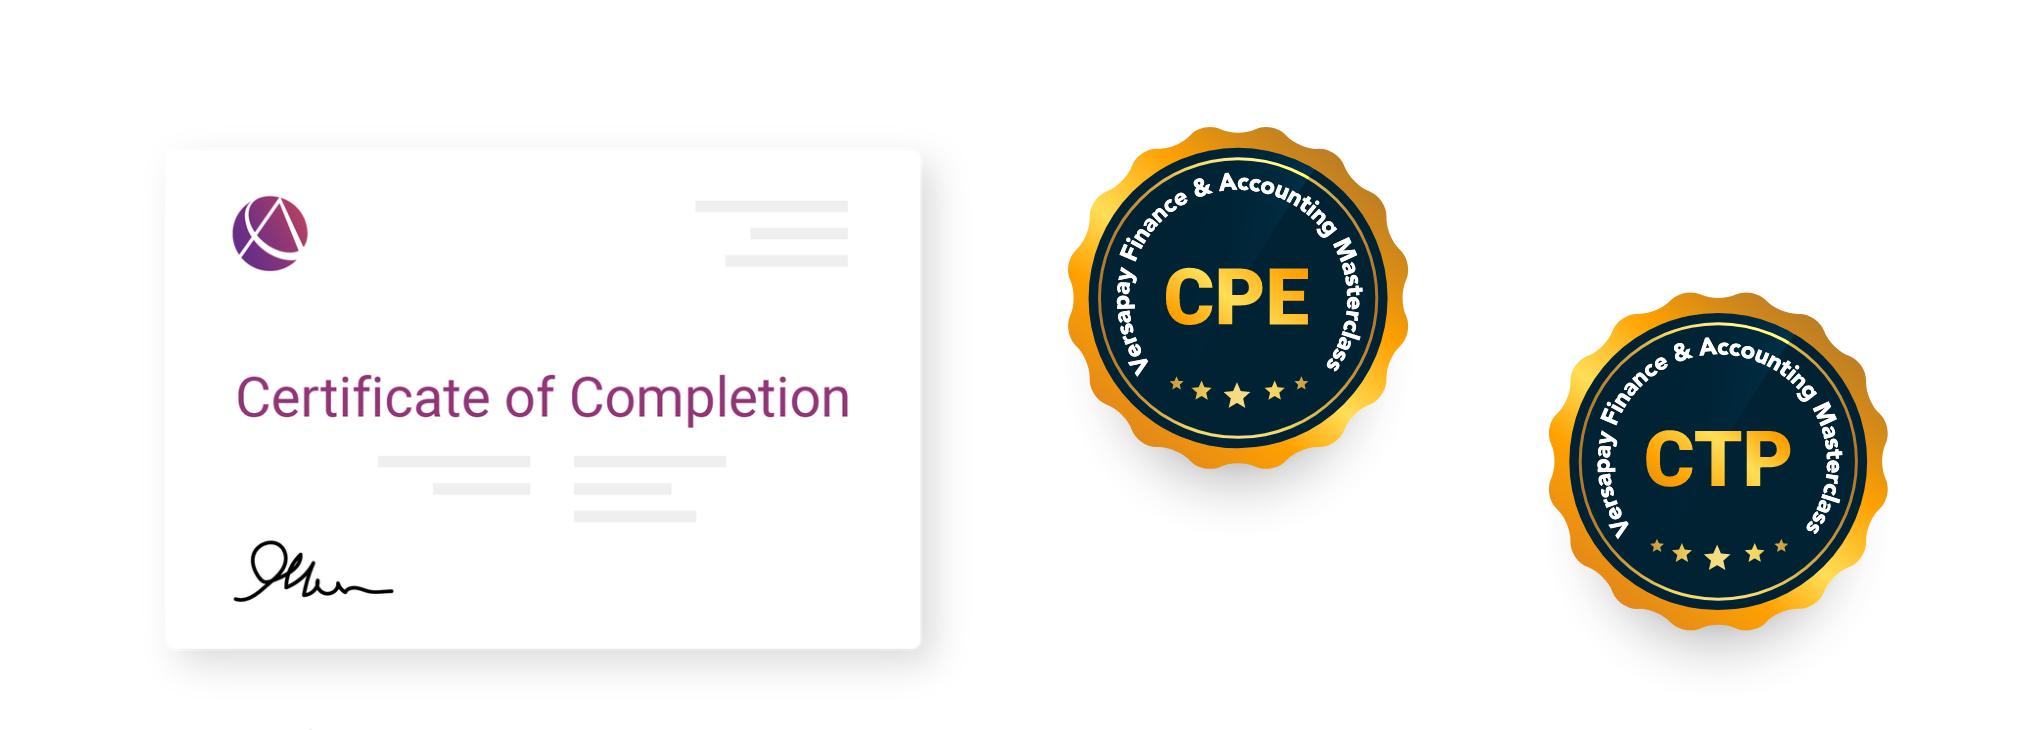 aicpa-certificate-cpe-ctp-credits